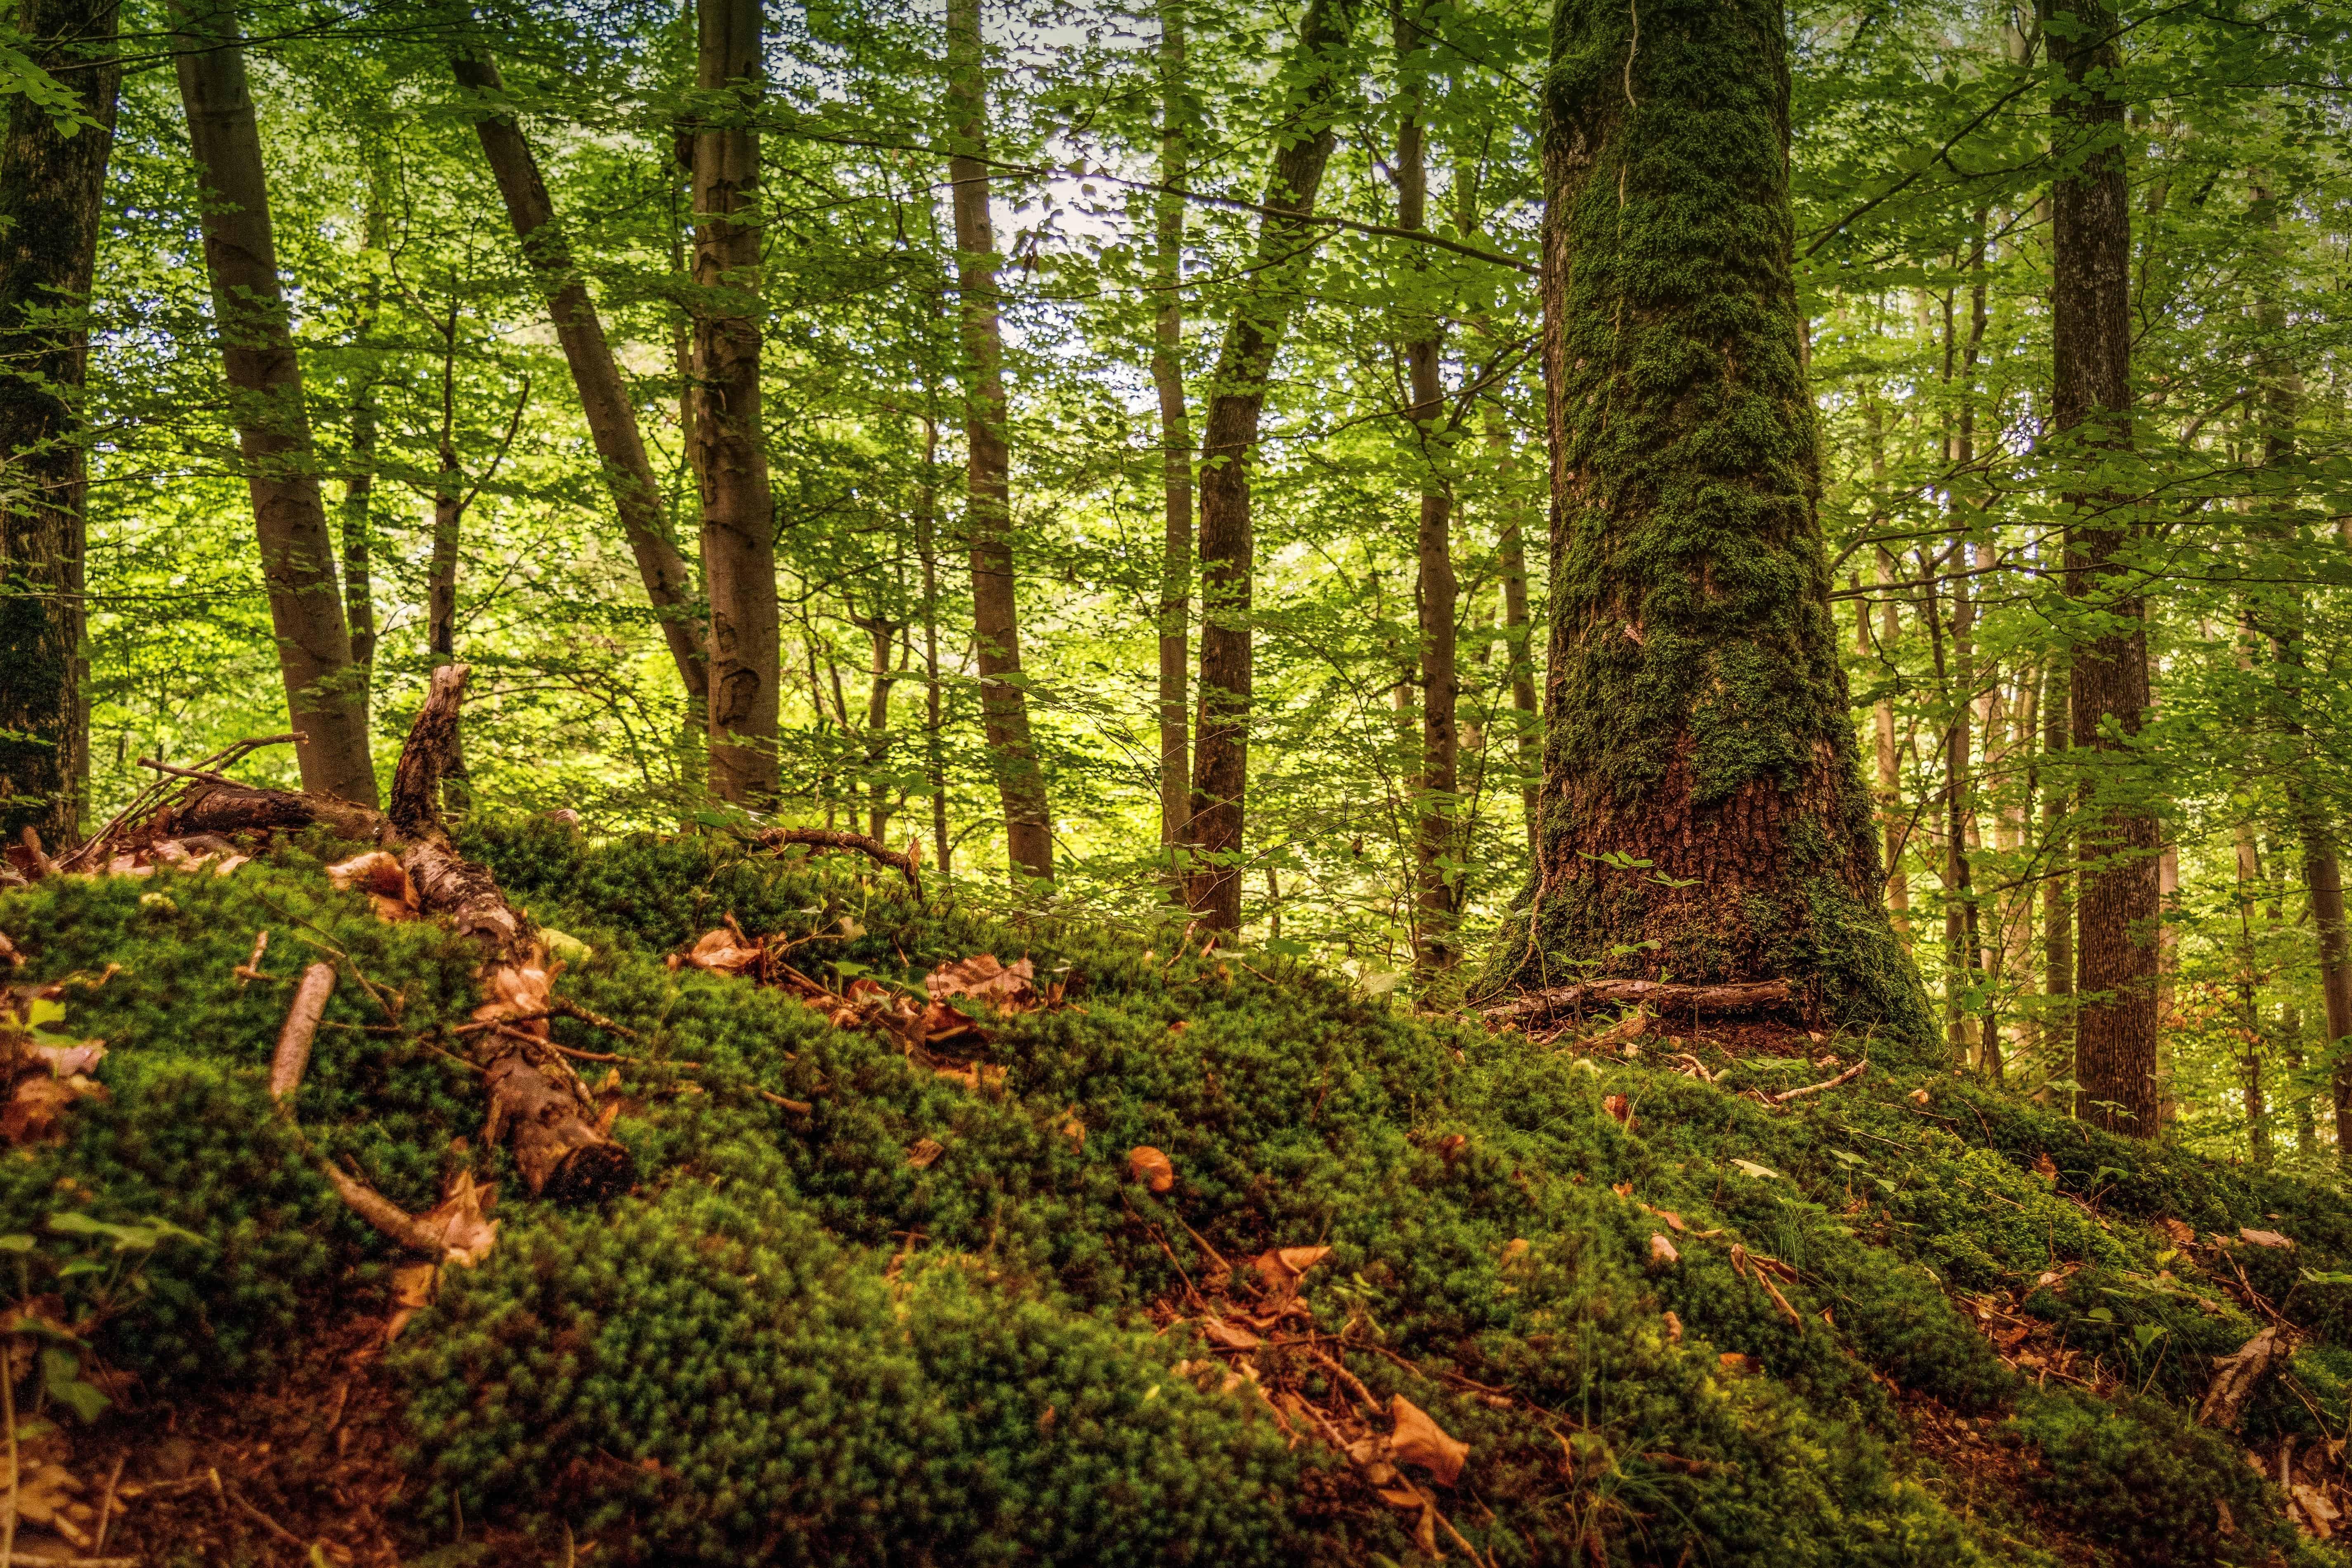 91 Gambar Pemandangan Hutan Dan Hewan HD